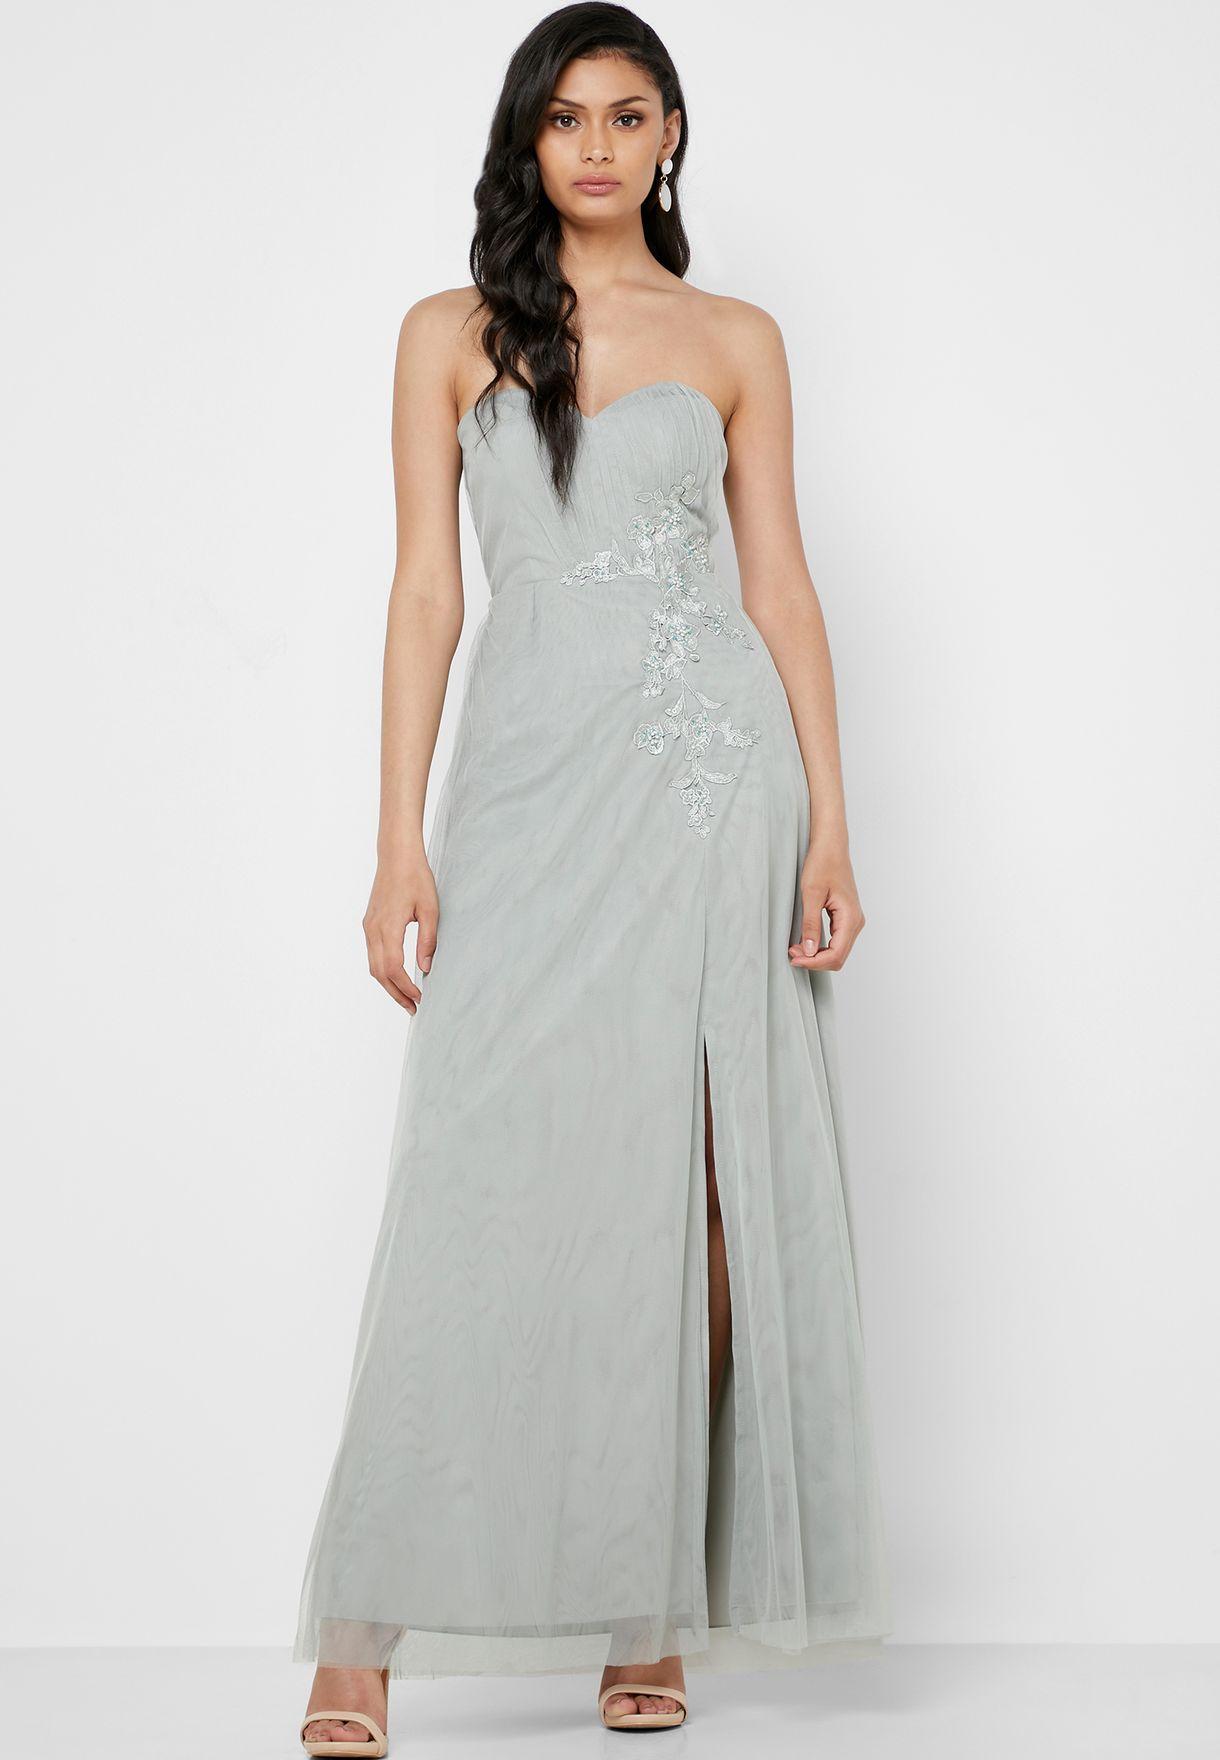 Embellished Sweetheart Dress